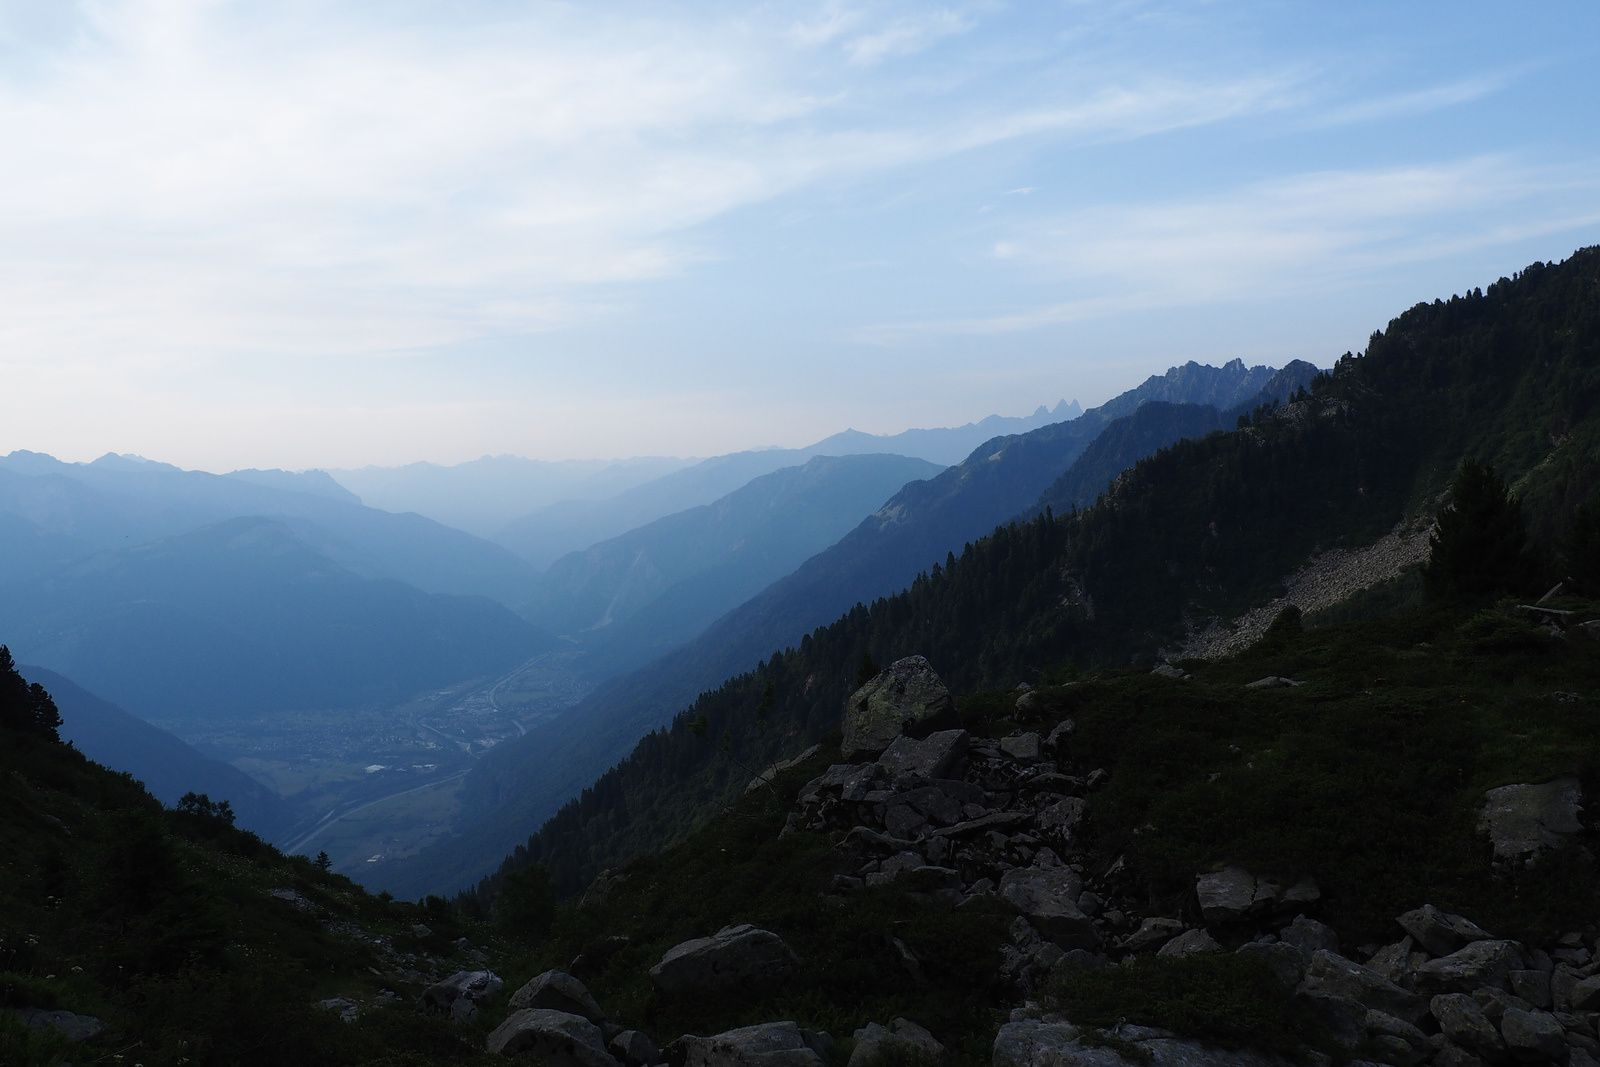 La vallée au fond